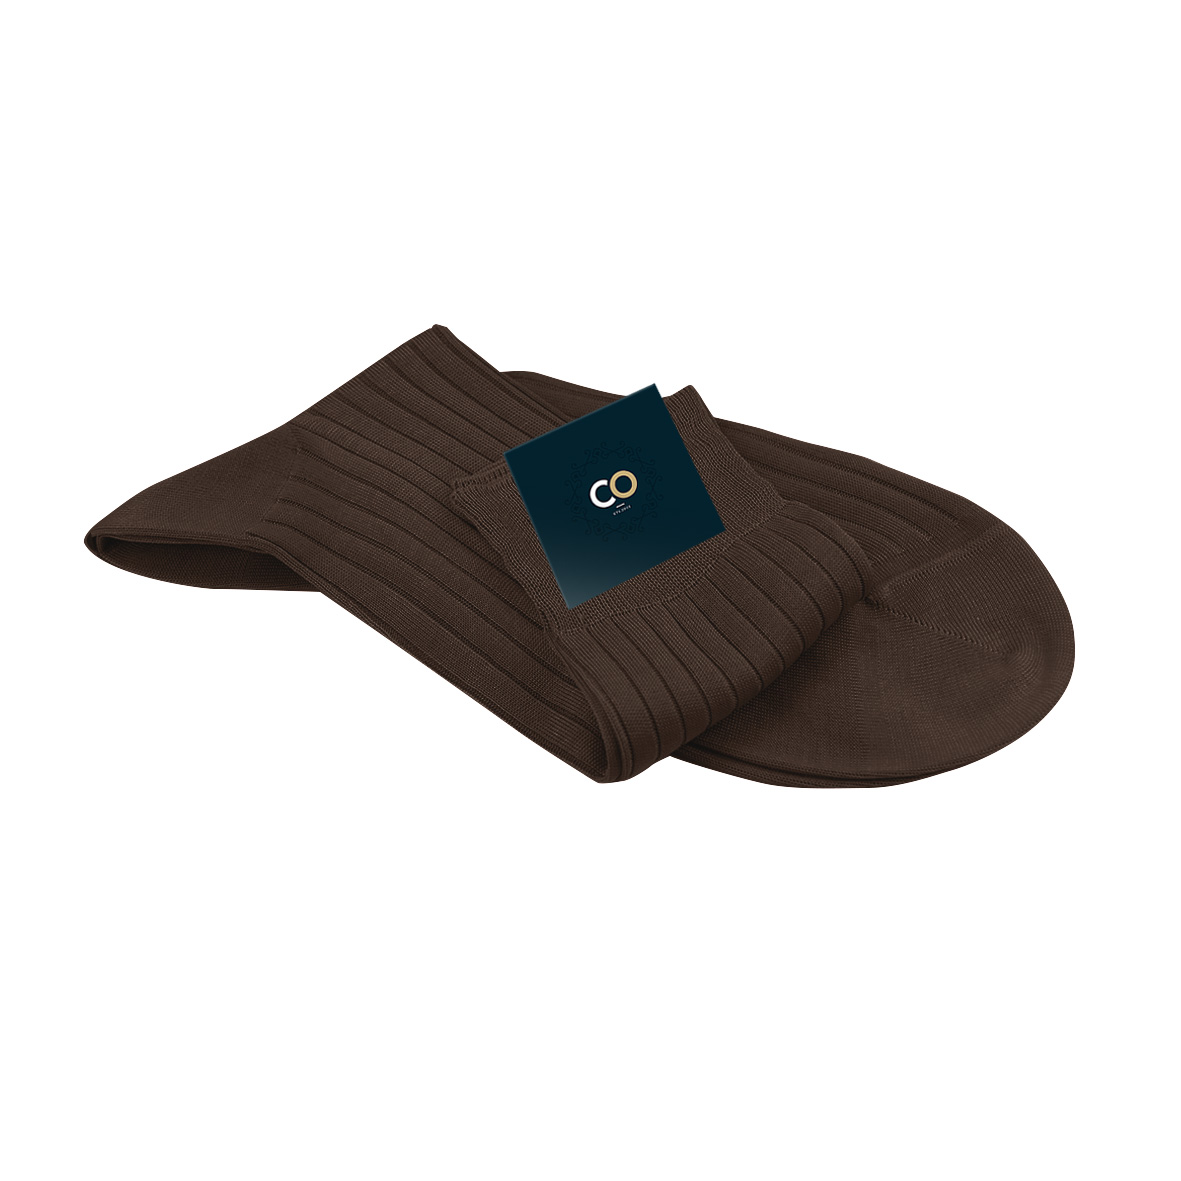 Chaussette Medard, Marron chocolat